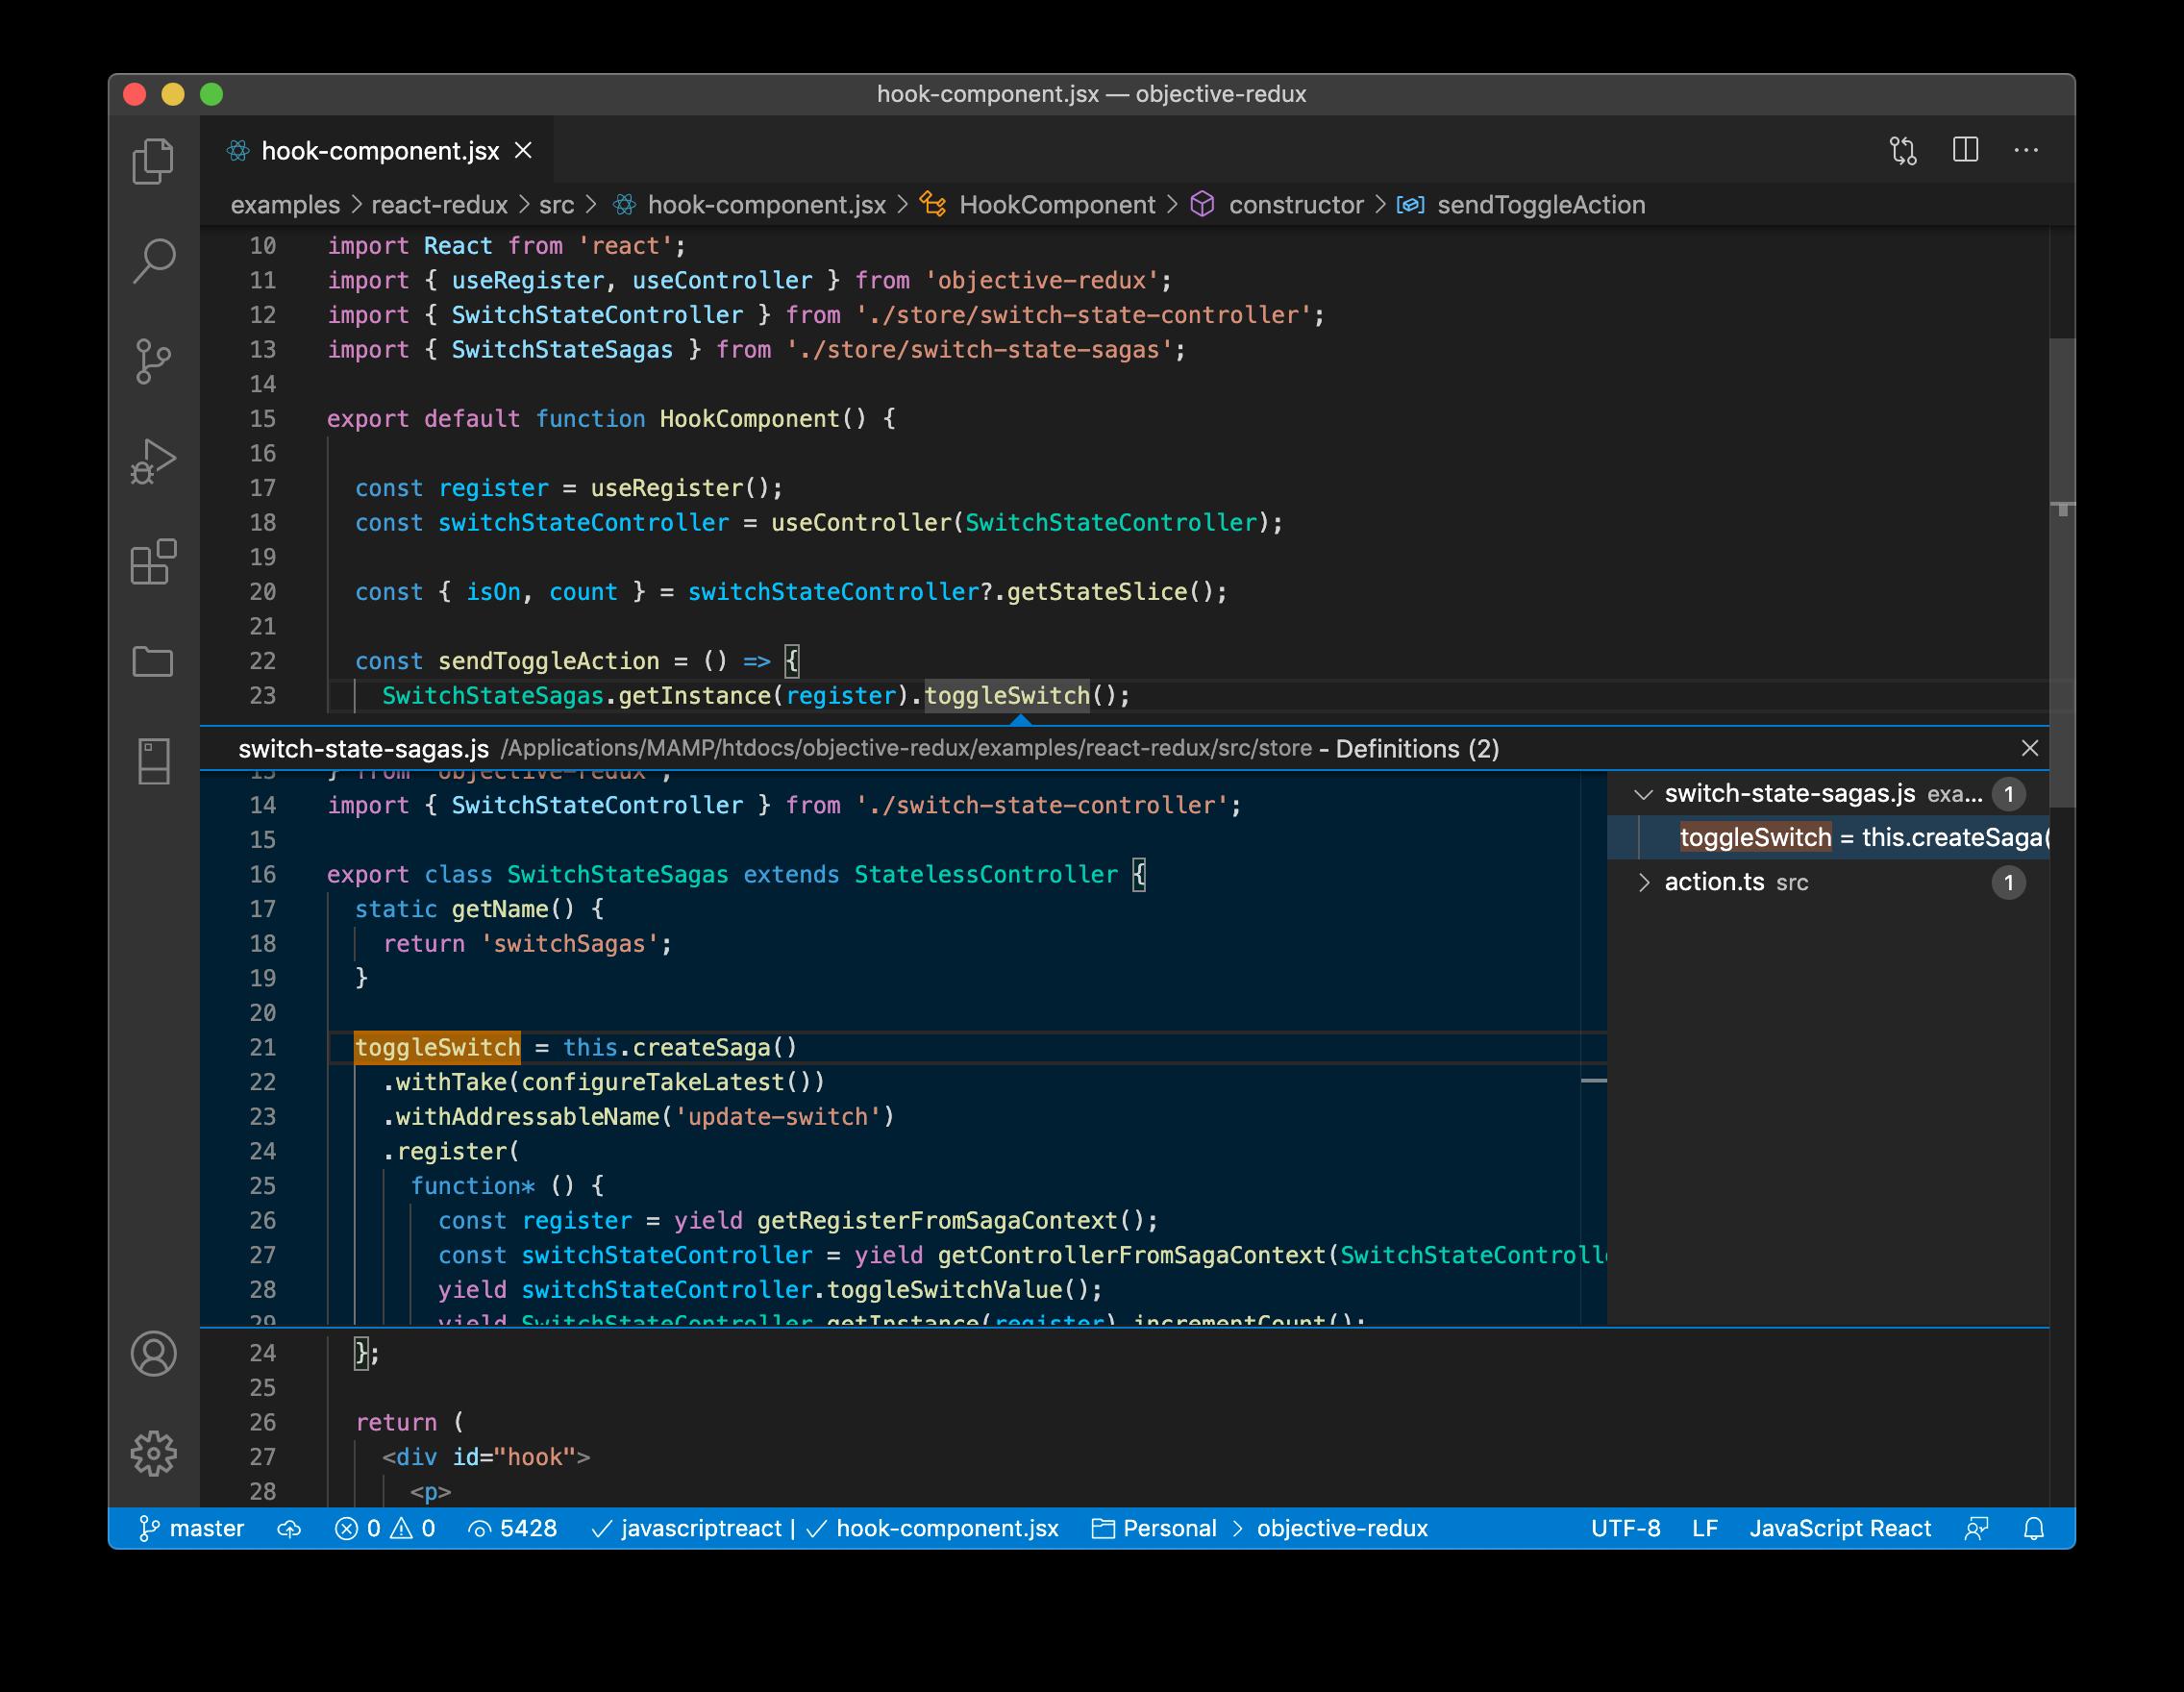 Debugging in VS Code